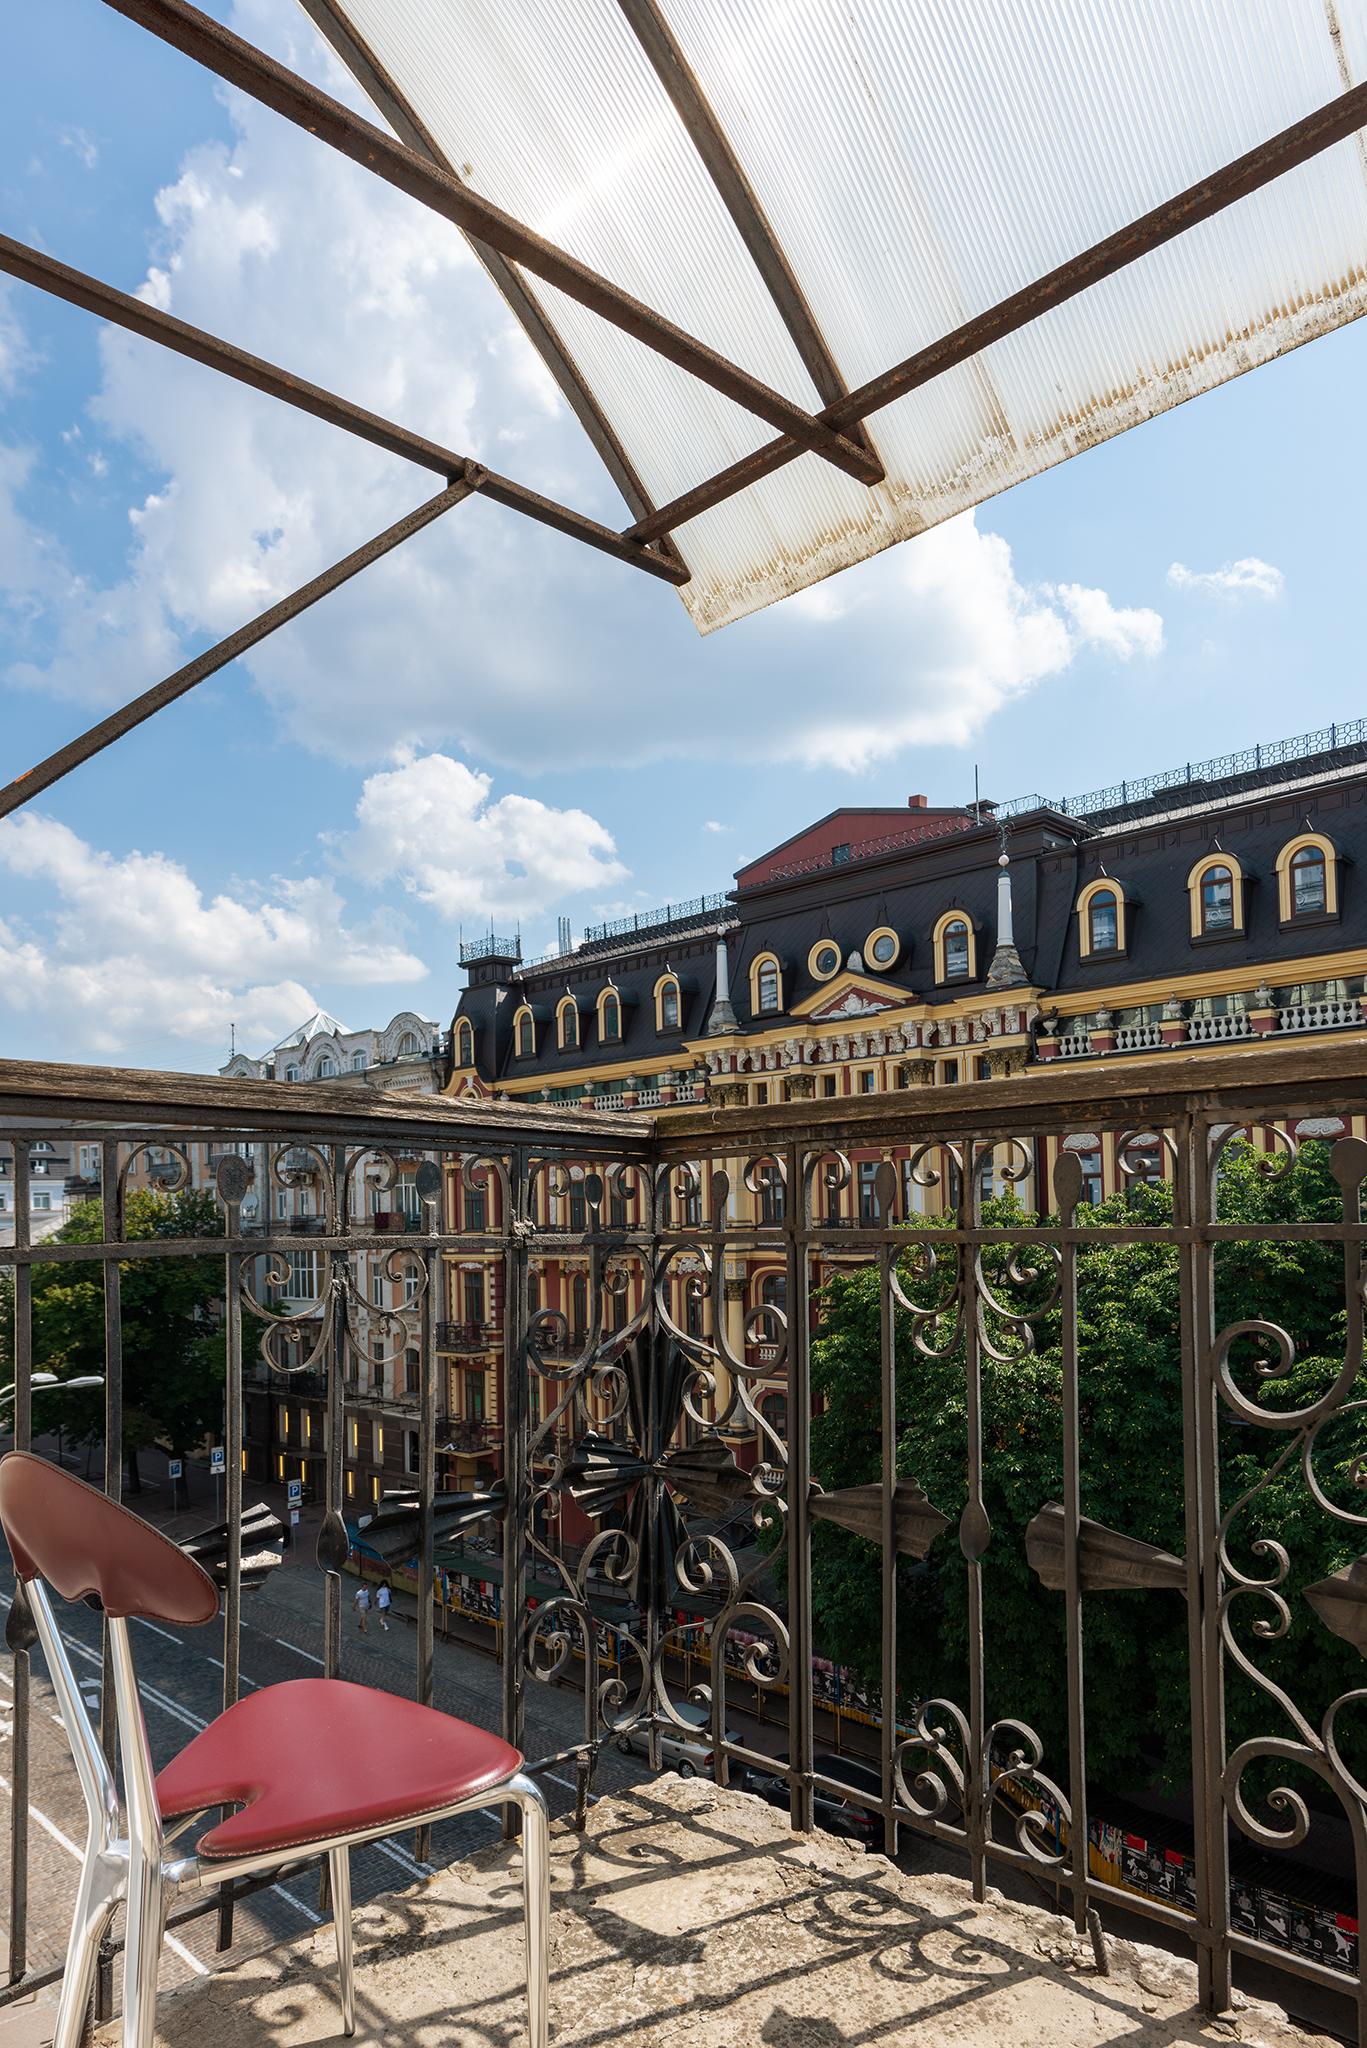 Investissement Immobilier Kiev, Ukraine - Balcon